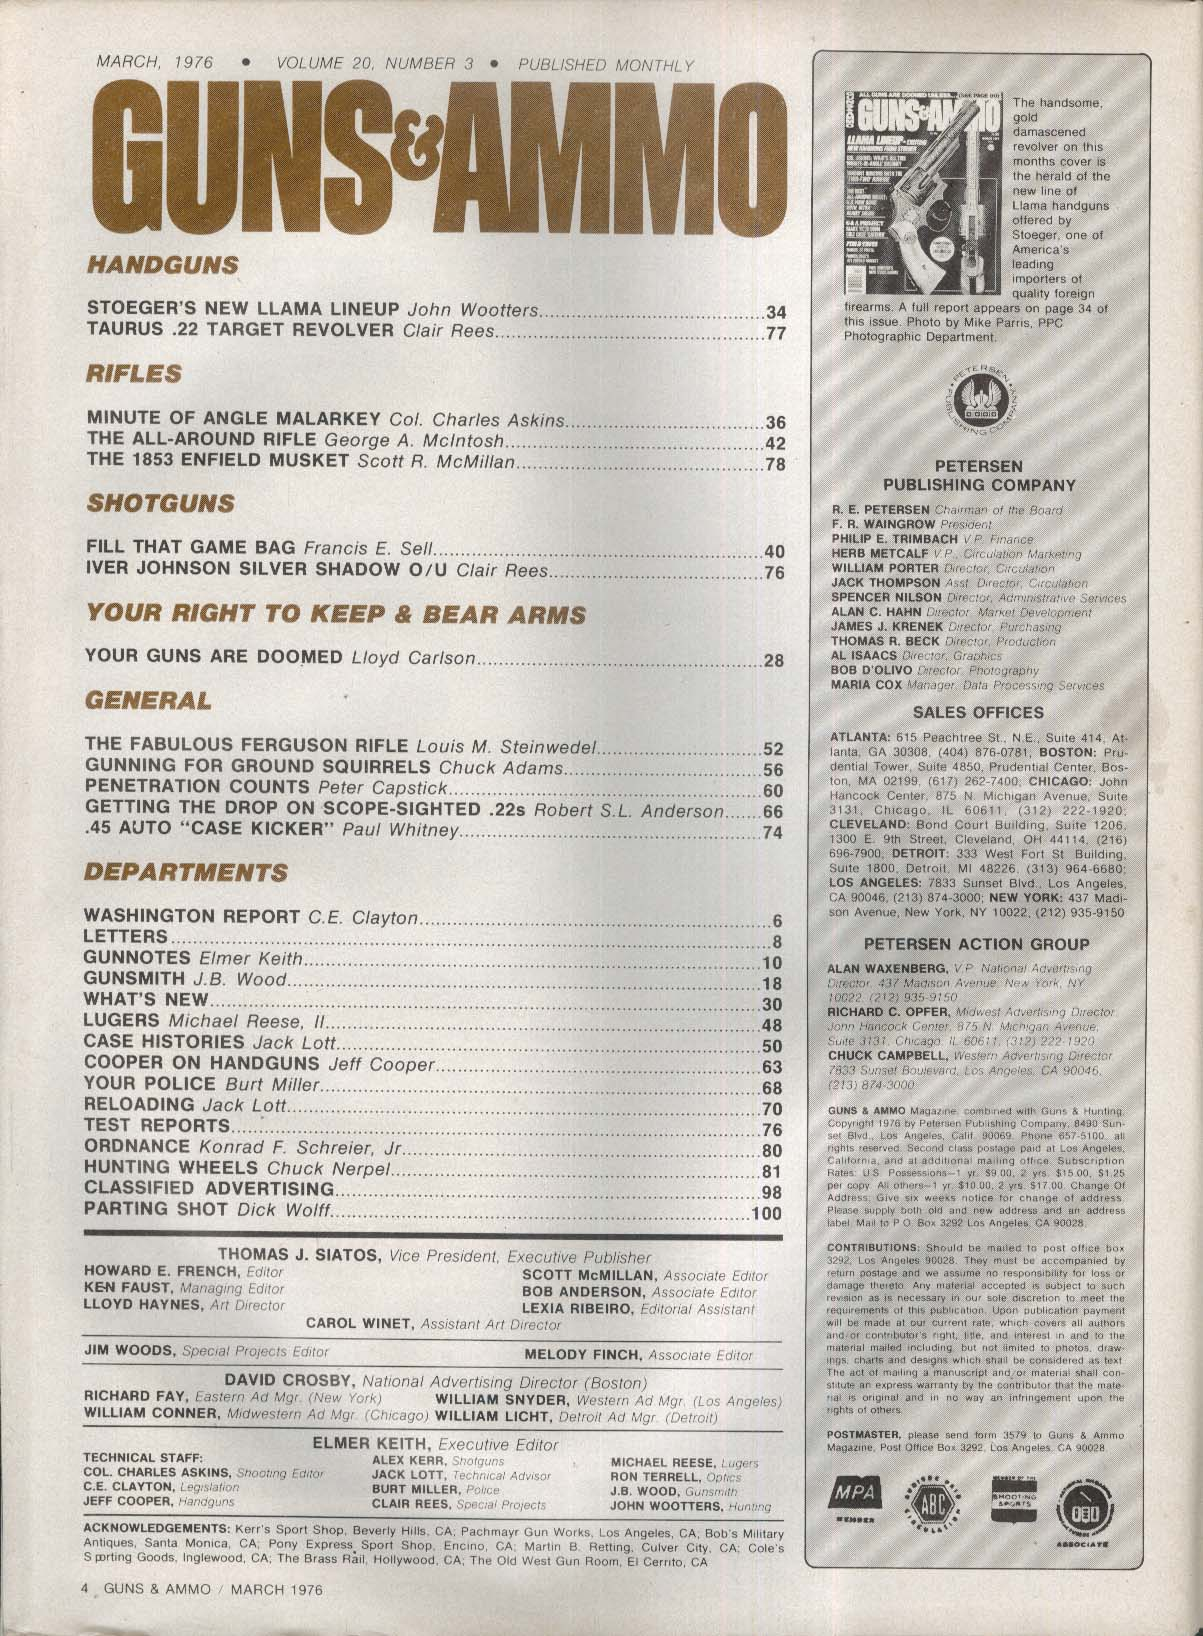 GUNS & AMMO Stoeger Llama Taurus Askins Varmint 1853 Enfield Iver Johnson 3 1976